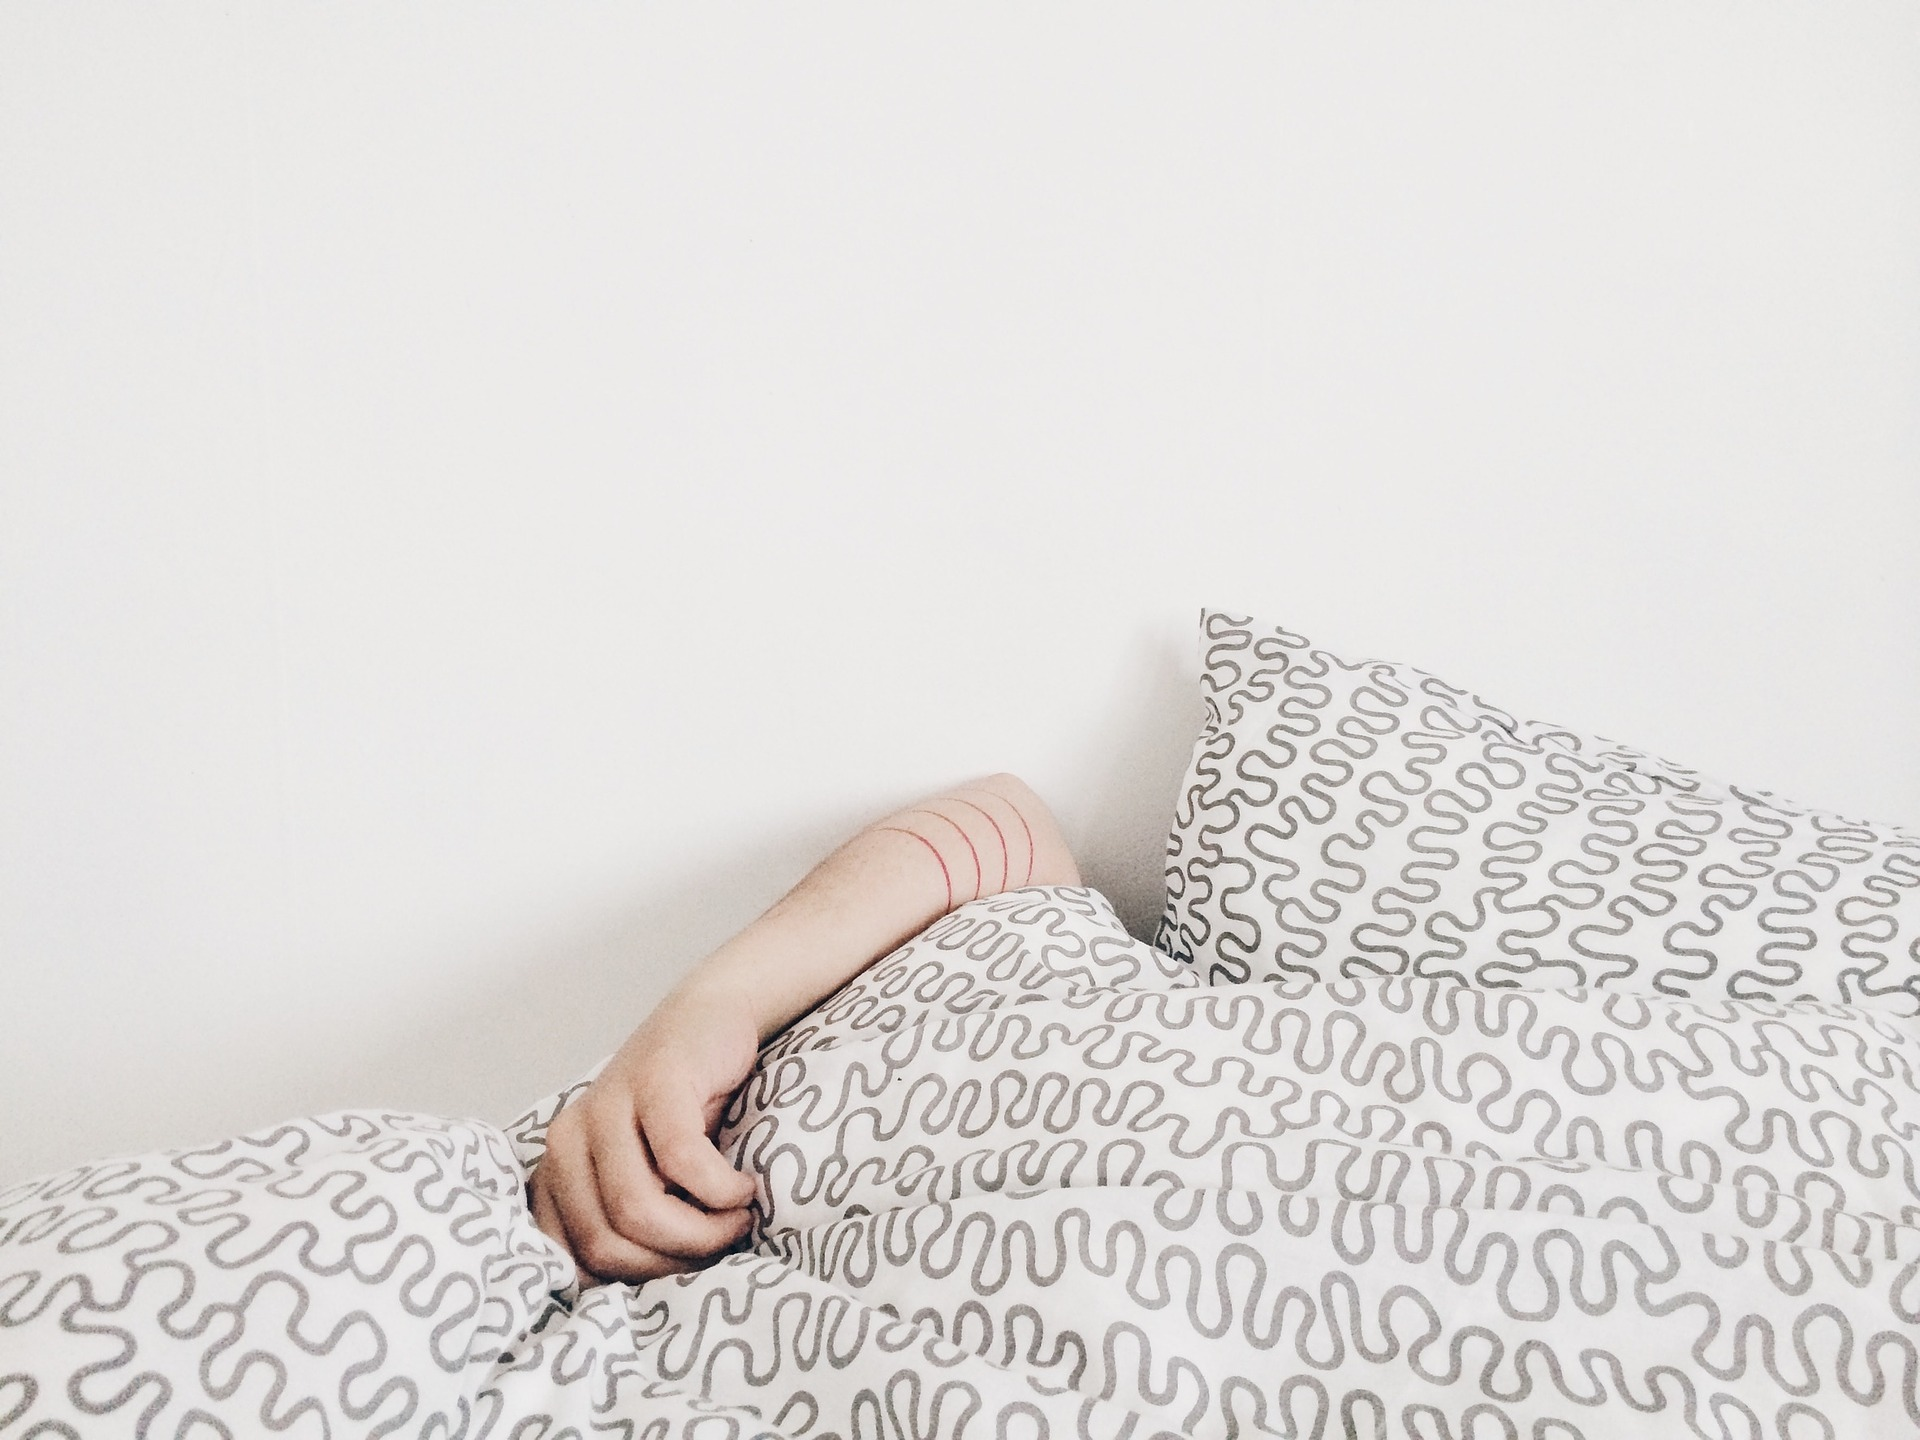 sleeping-690429_1920.jpg